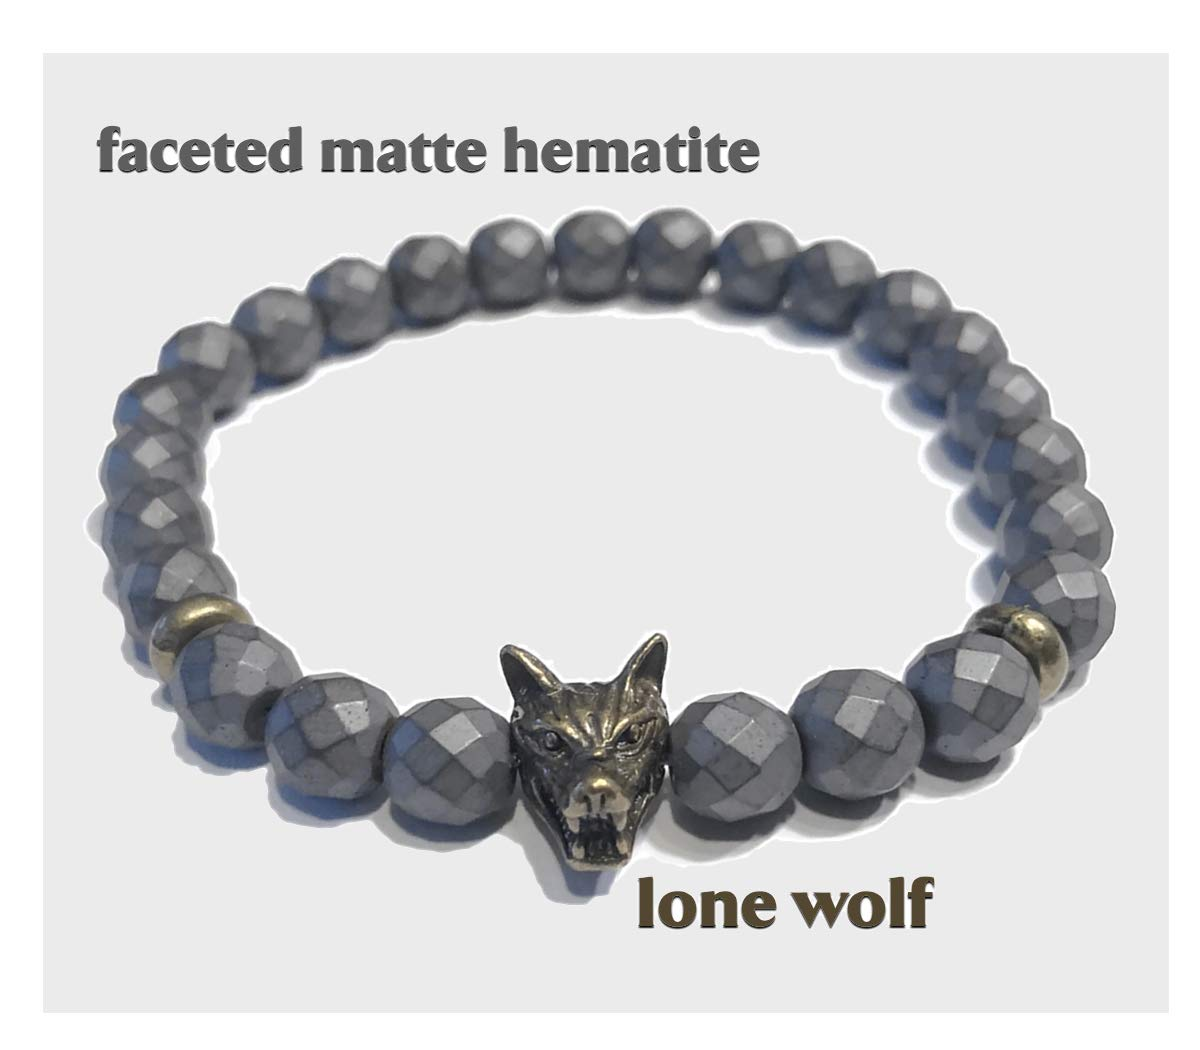 KarmaArm Wolf Bracelets, Meditation Bracelets Beaded Yoga Reiki Healing Boho Chakra Wrap Stretch Jewelry & Gifts   Leader of The Pack: Hematite (6)